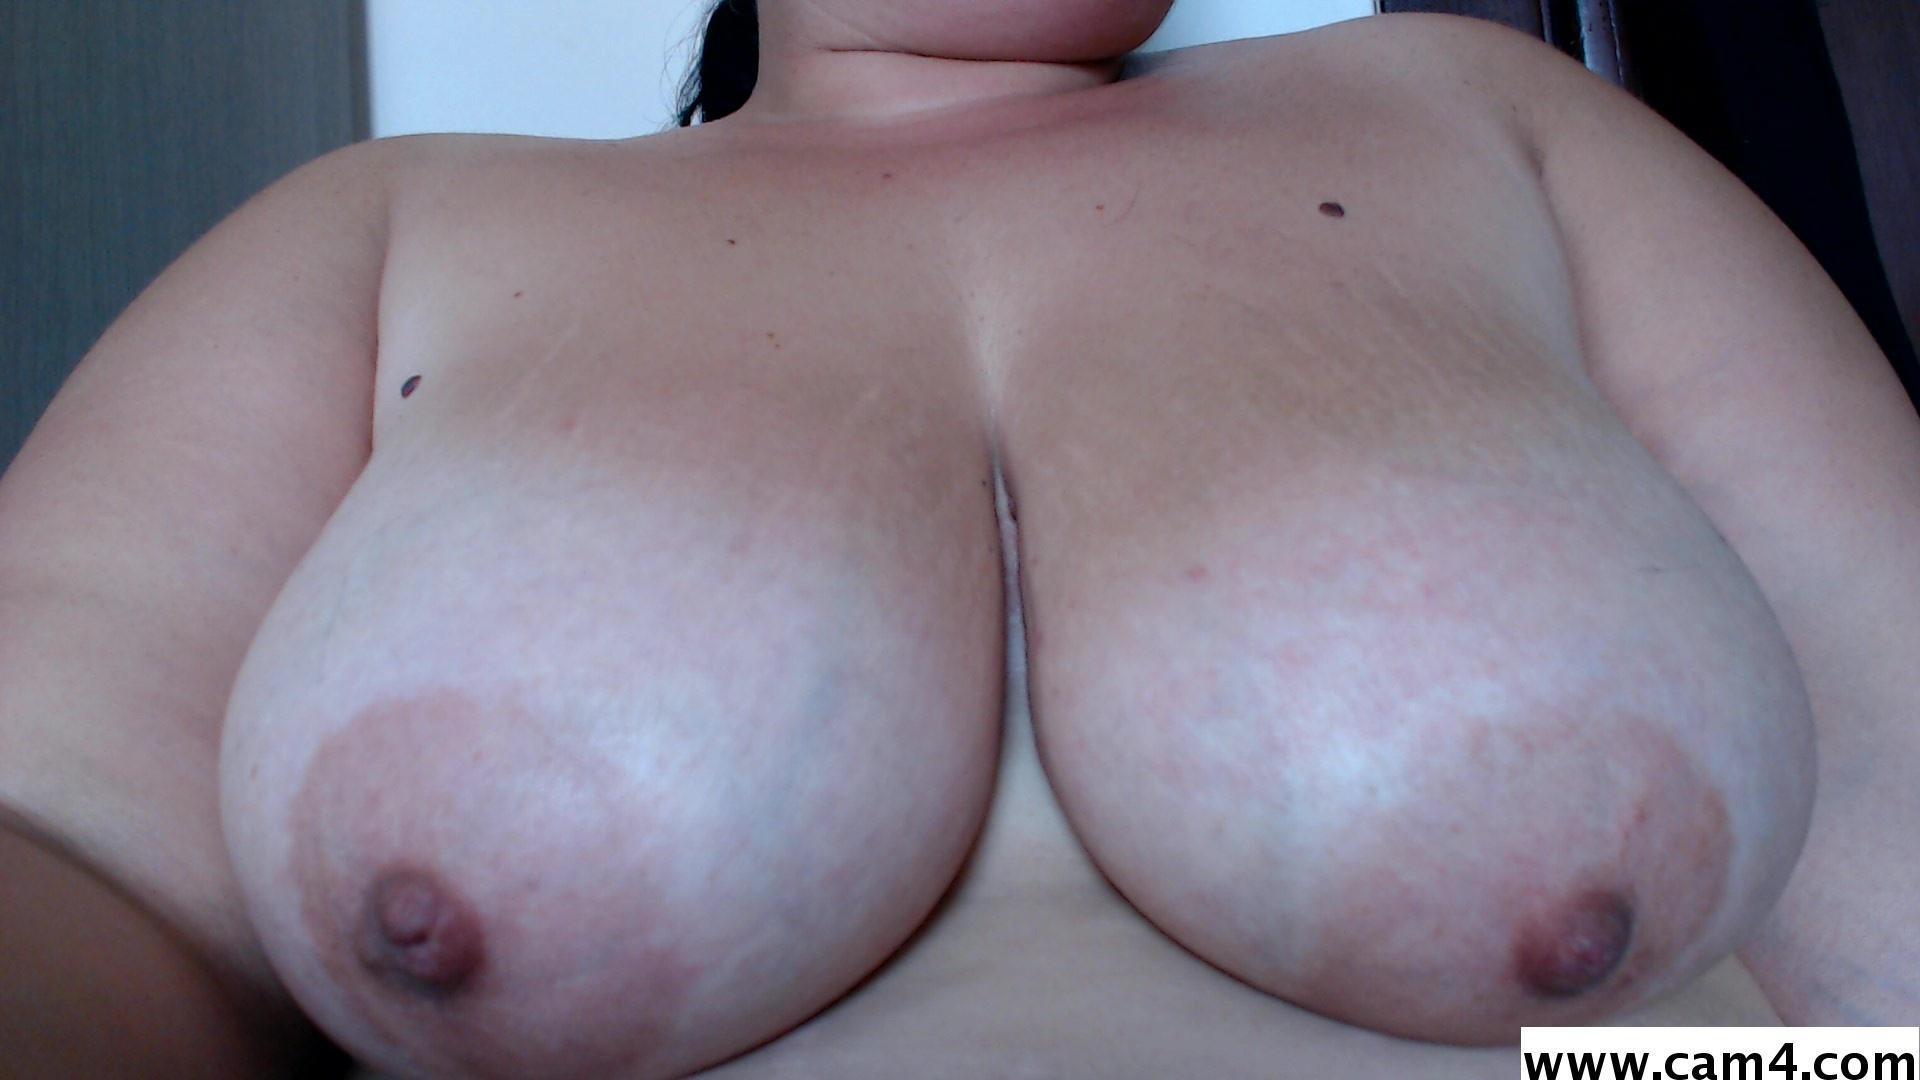 Eroticjessi?s=cu4mbk1eok68lerzqkfuonlxuii3o3ky1fa50sjgnoa=